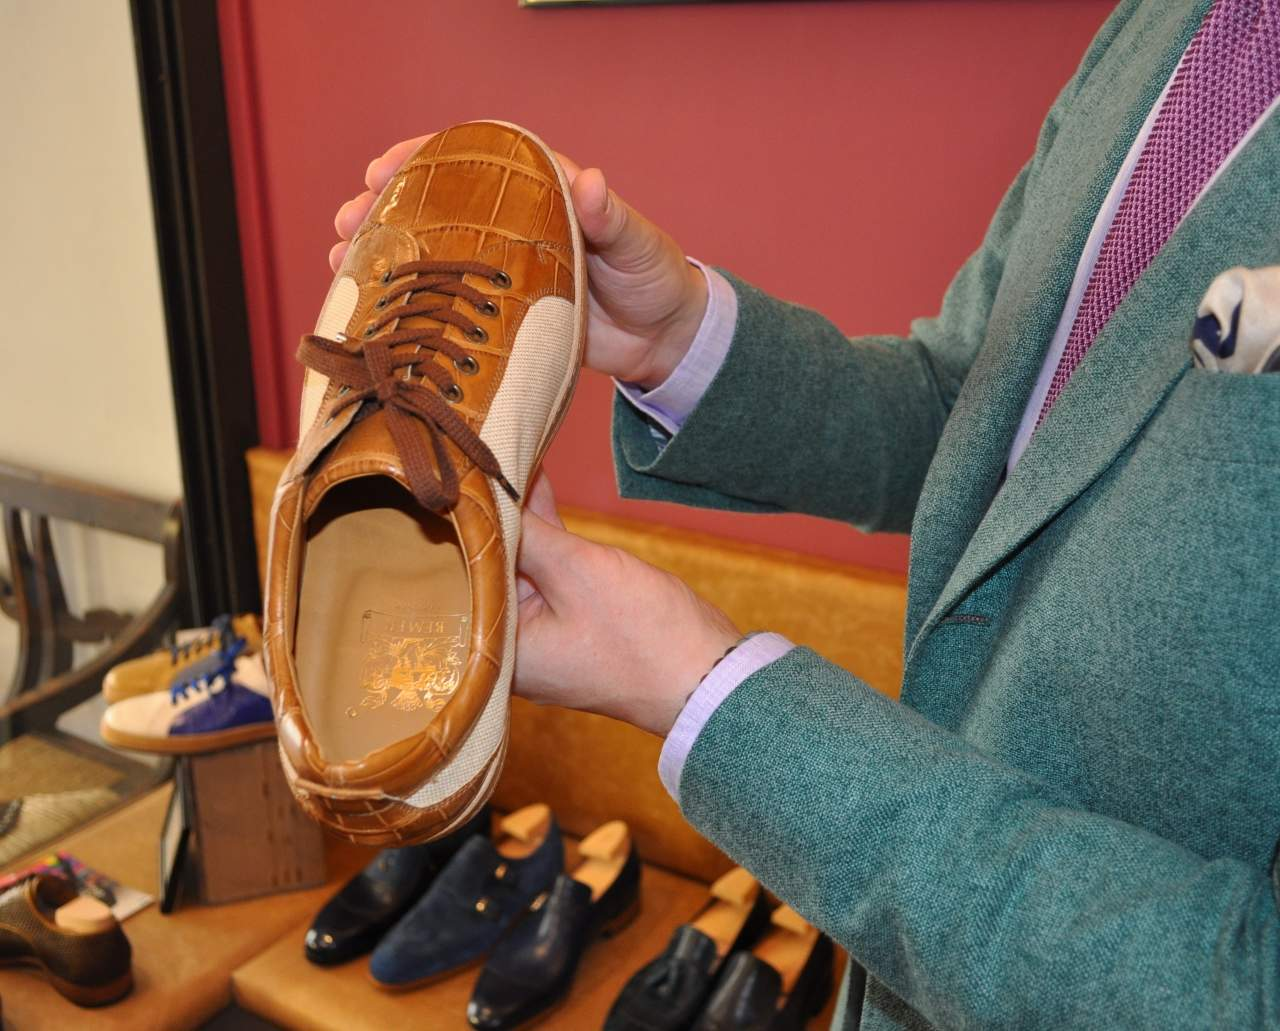 Mario Bemer crocodile sneakers